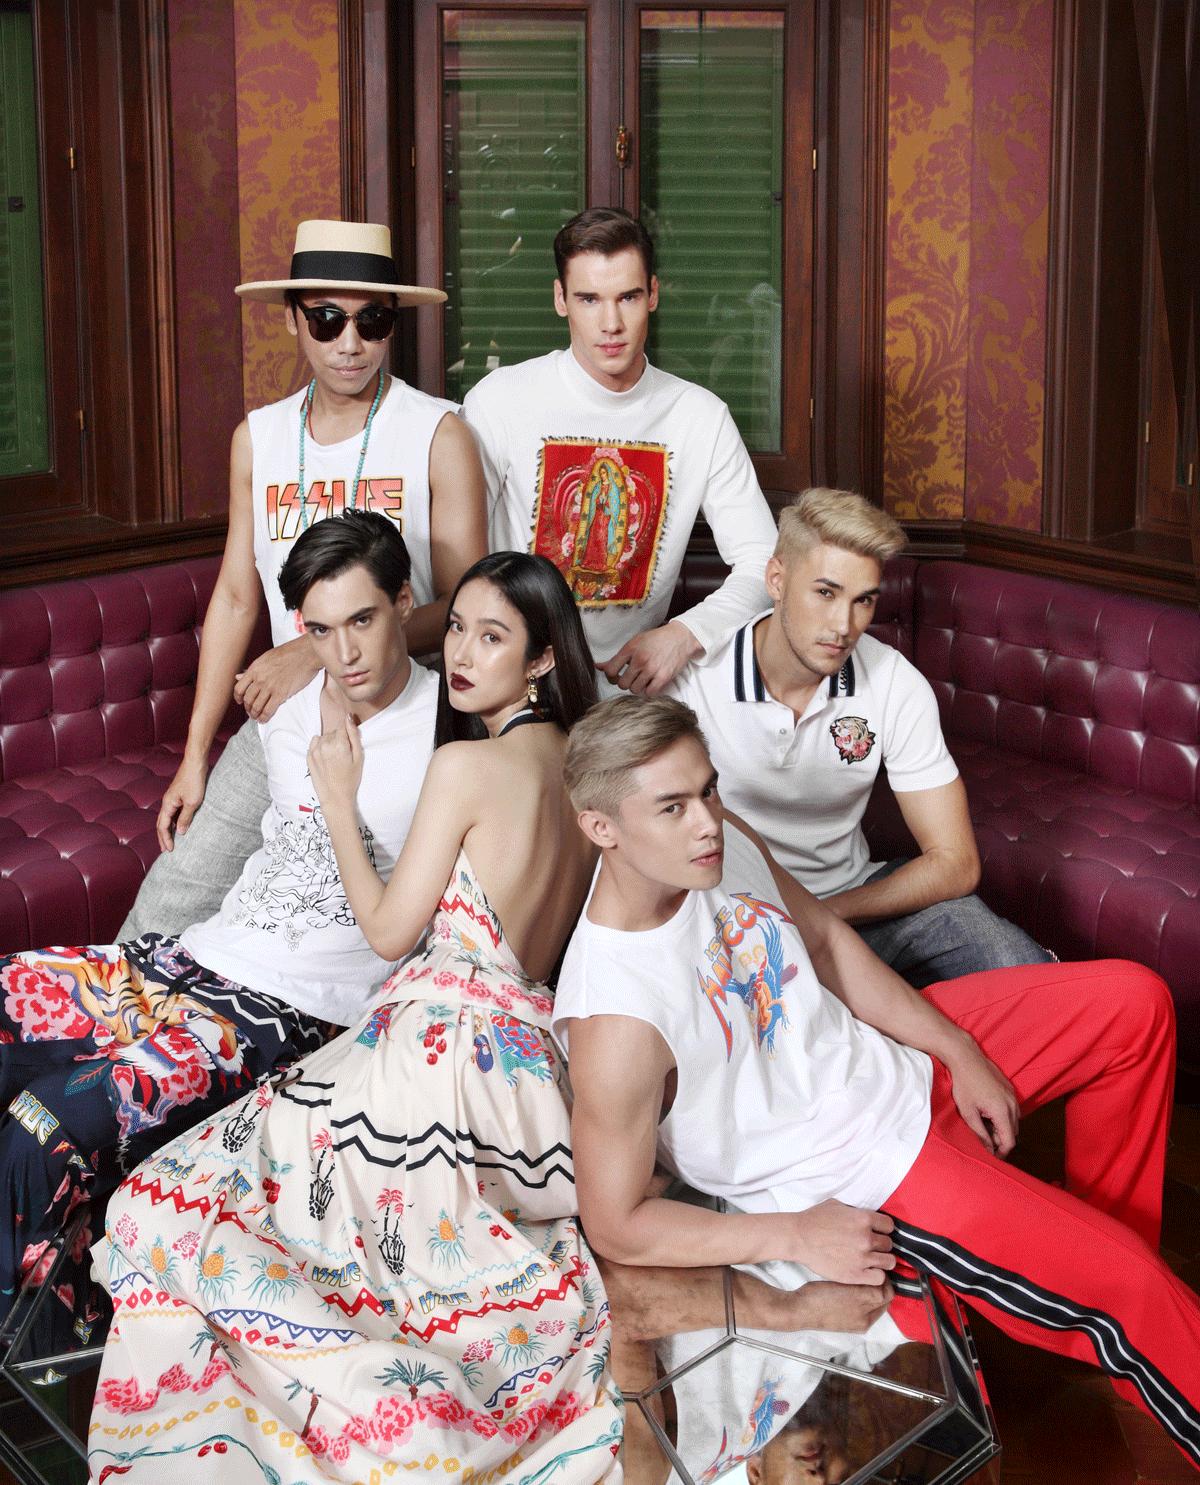 Roj Bhubawit Kritpholnara / ISSUE owner with his models